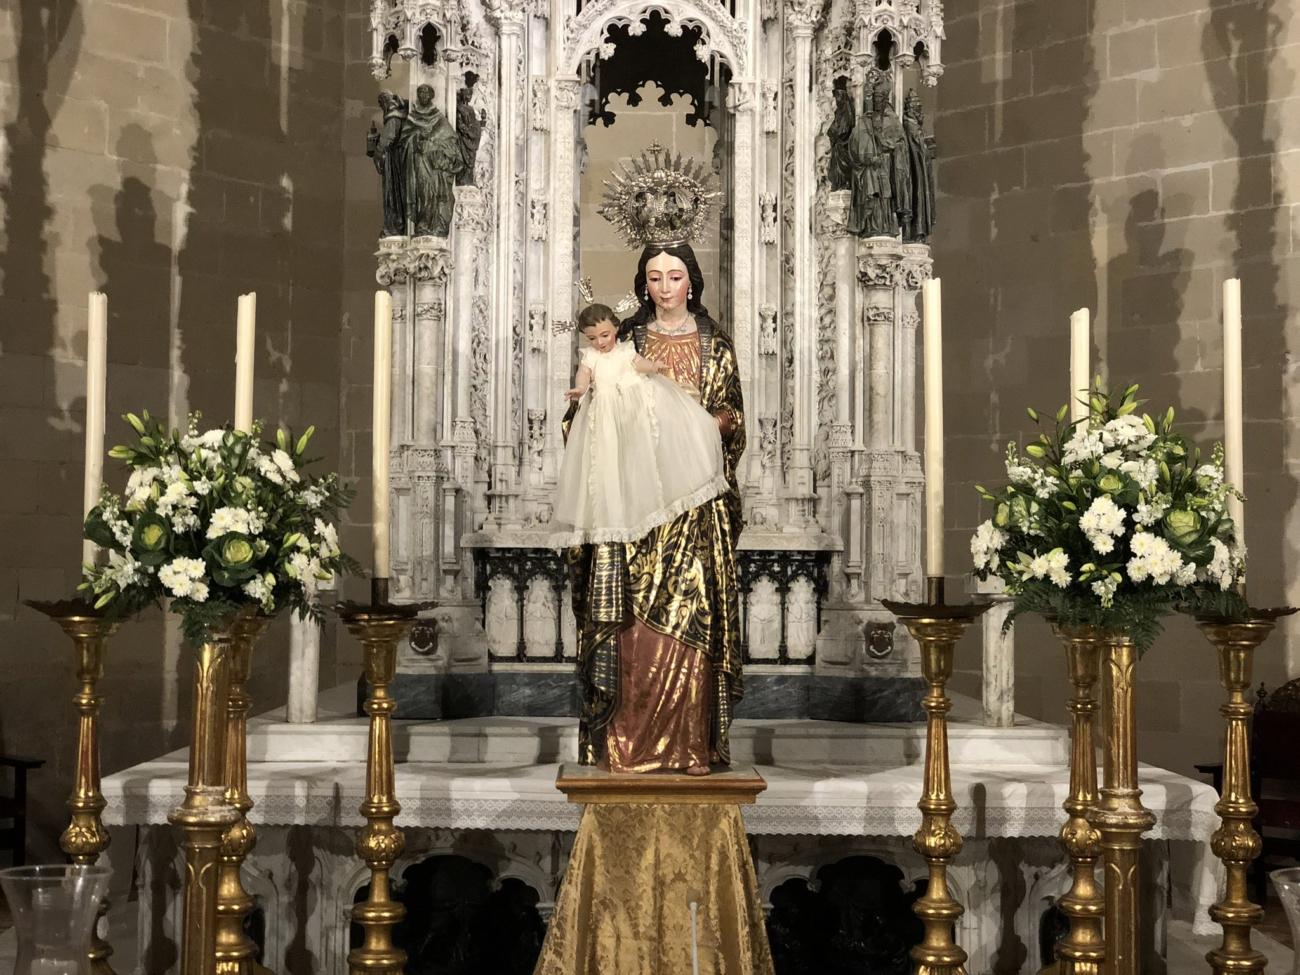 Ntra. Sra. de la Paz – Sacramental de Santiago